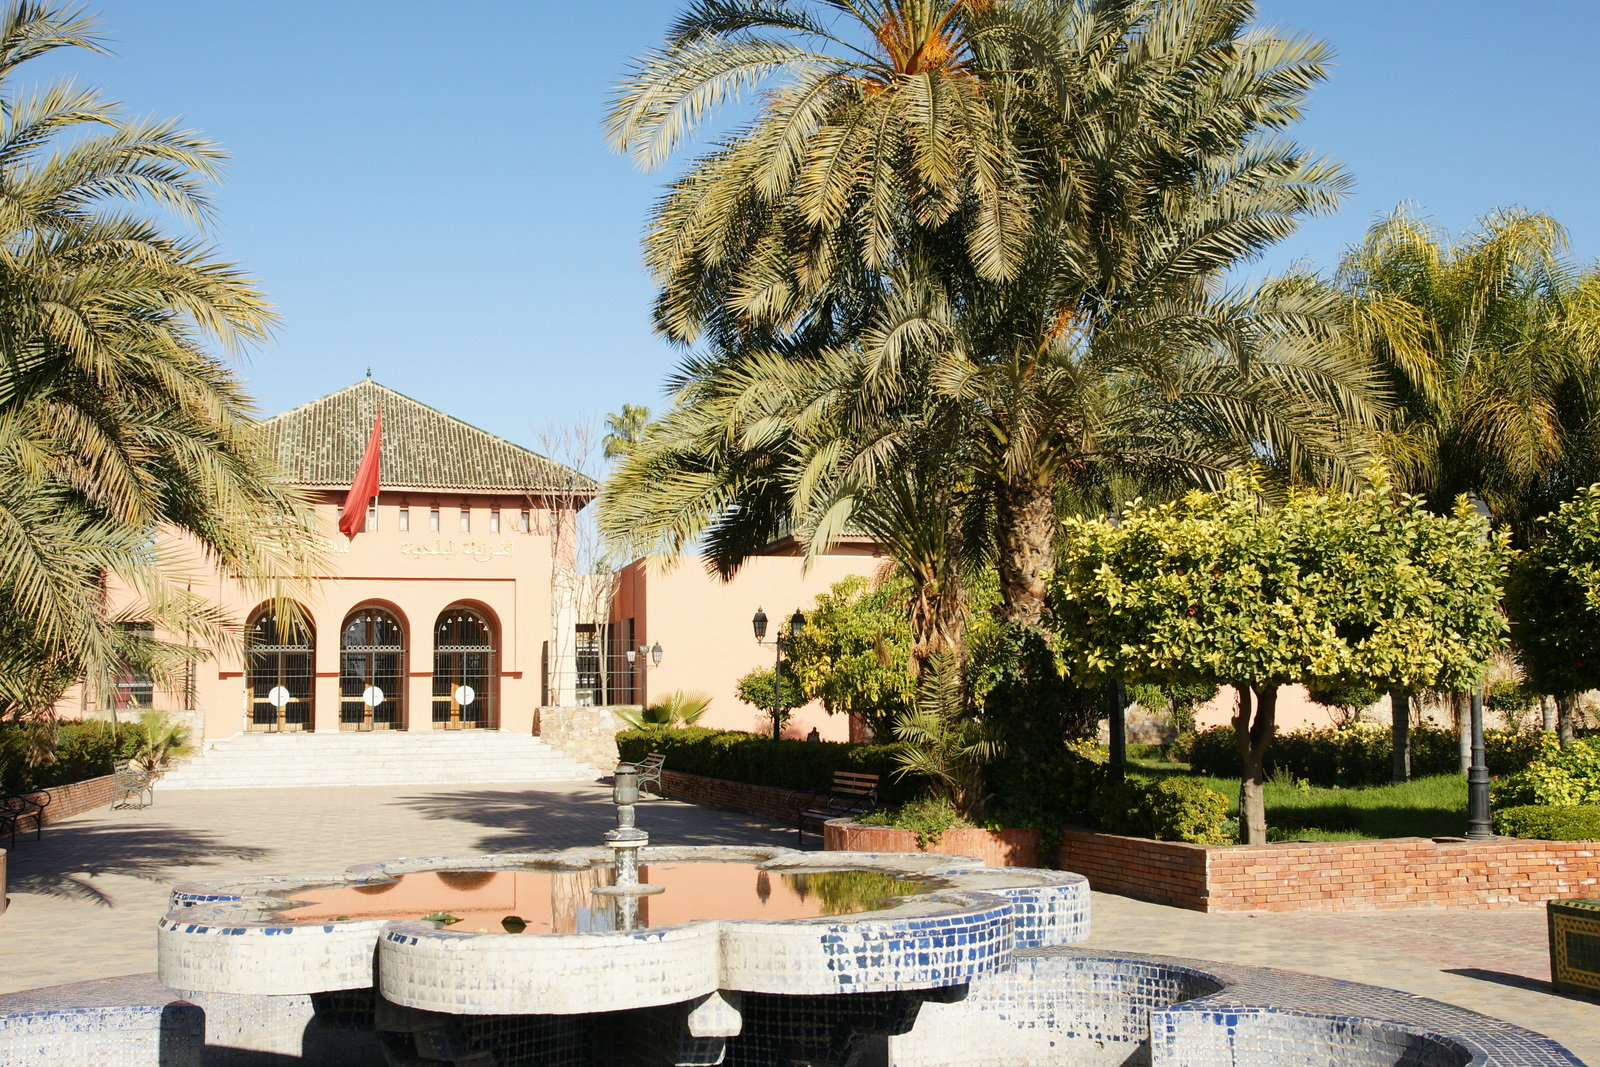 Le jardin de la koutoubia voyage marrakech janvier for Jardin koutoubia